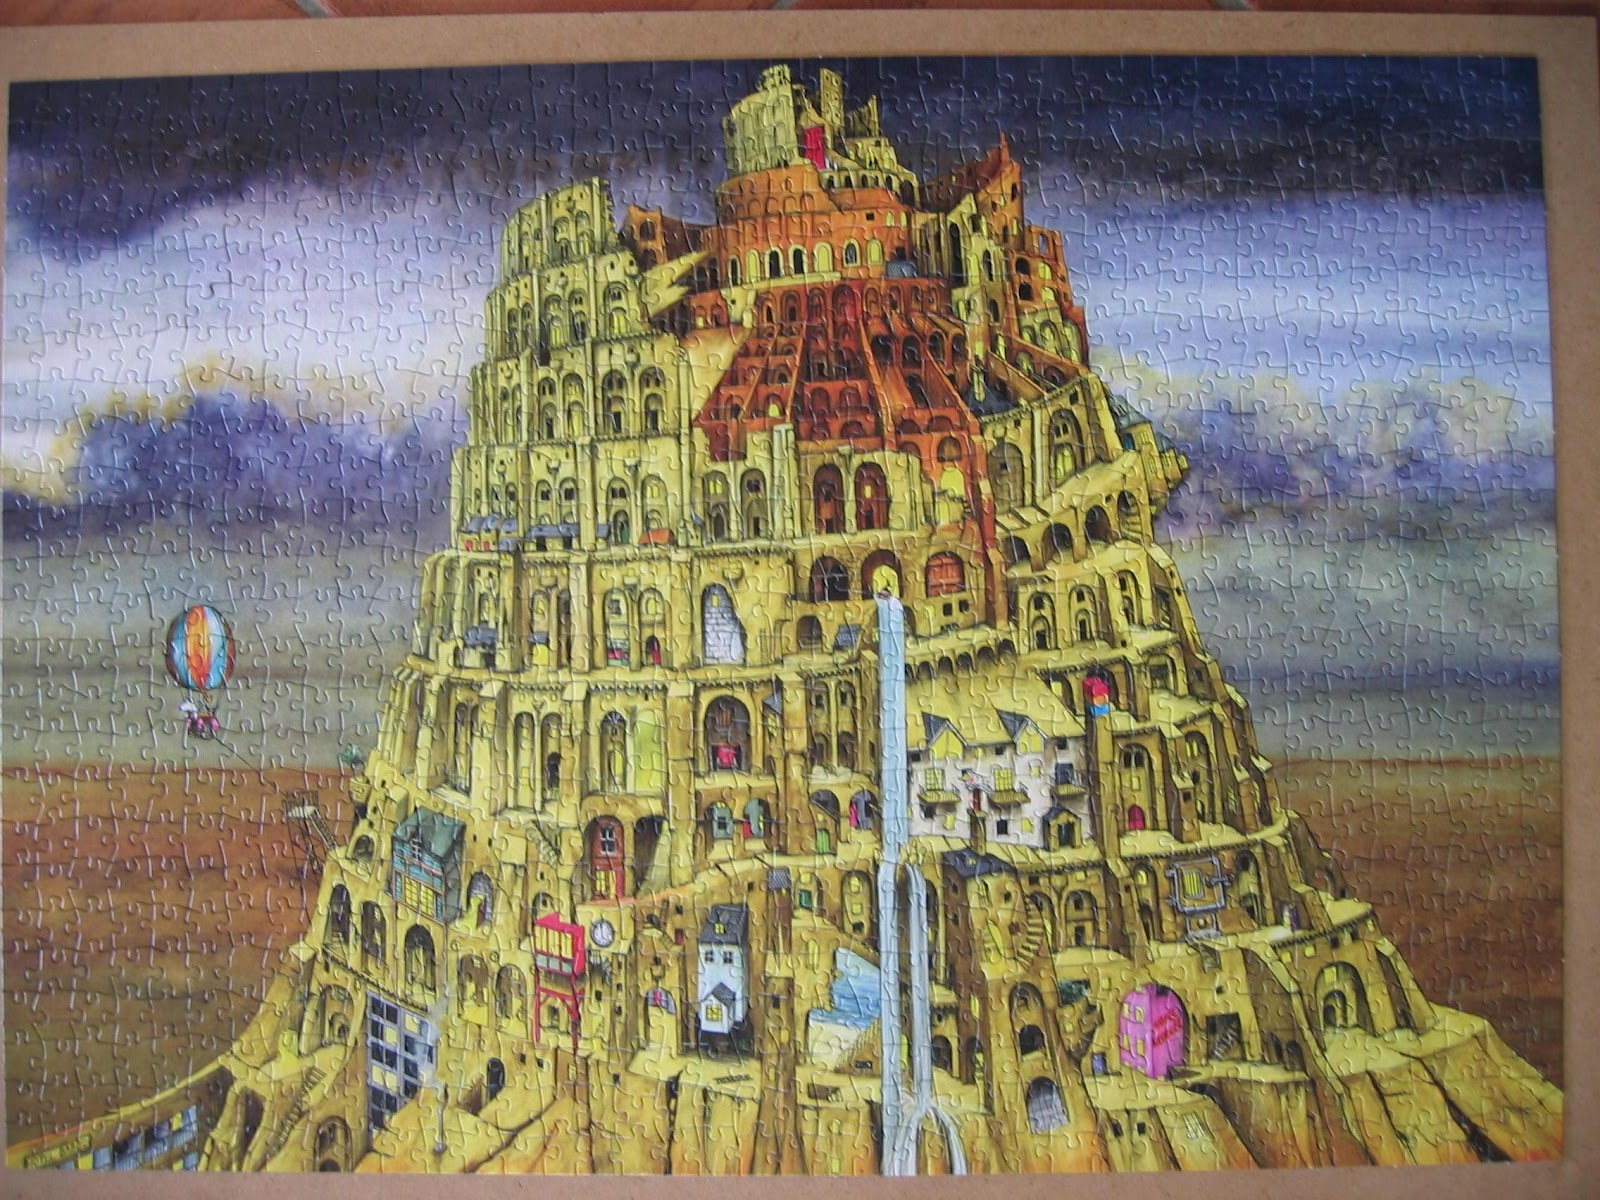 Turmbau von Babel | W-...